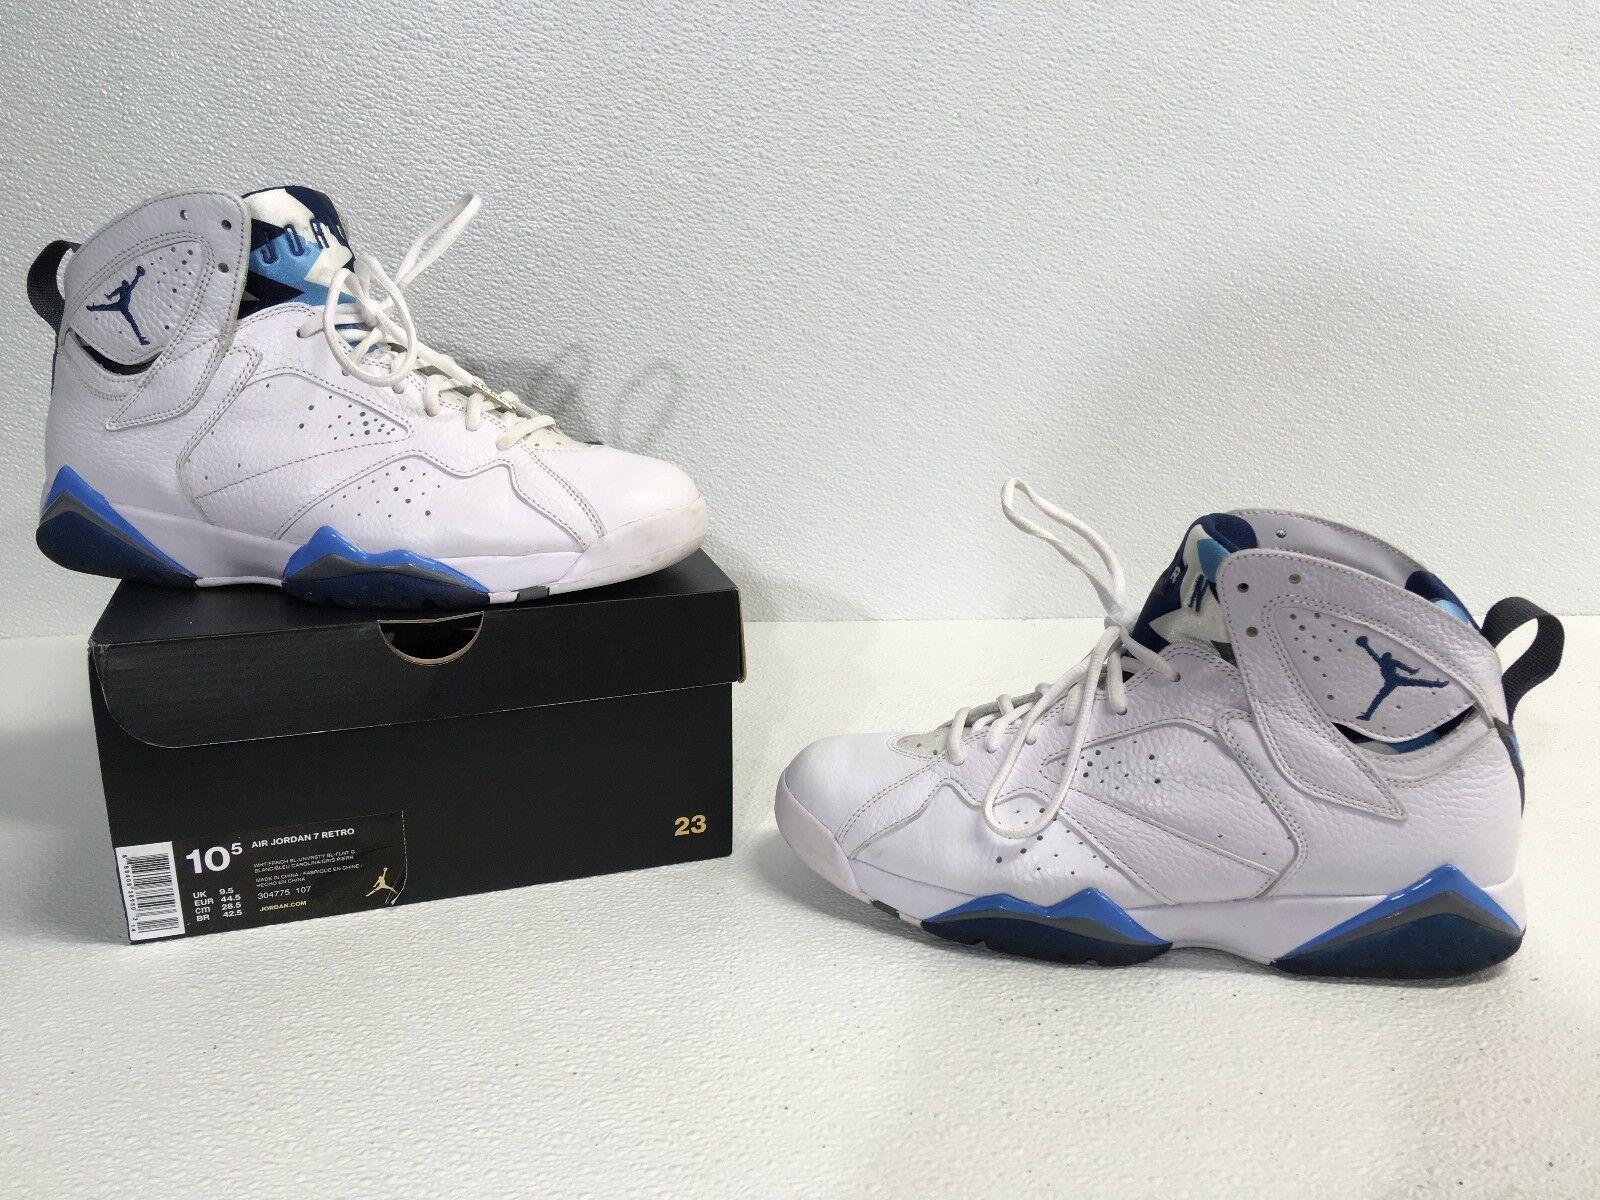 Jordan VII French Blue size 10.5 Cheap women's shoes women's shoes